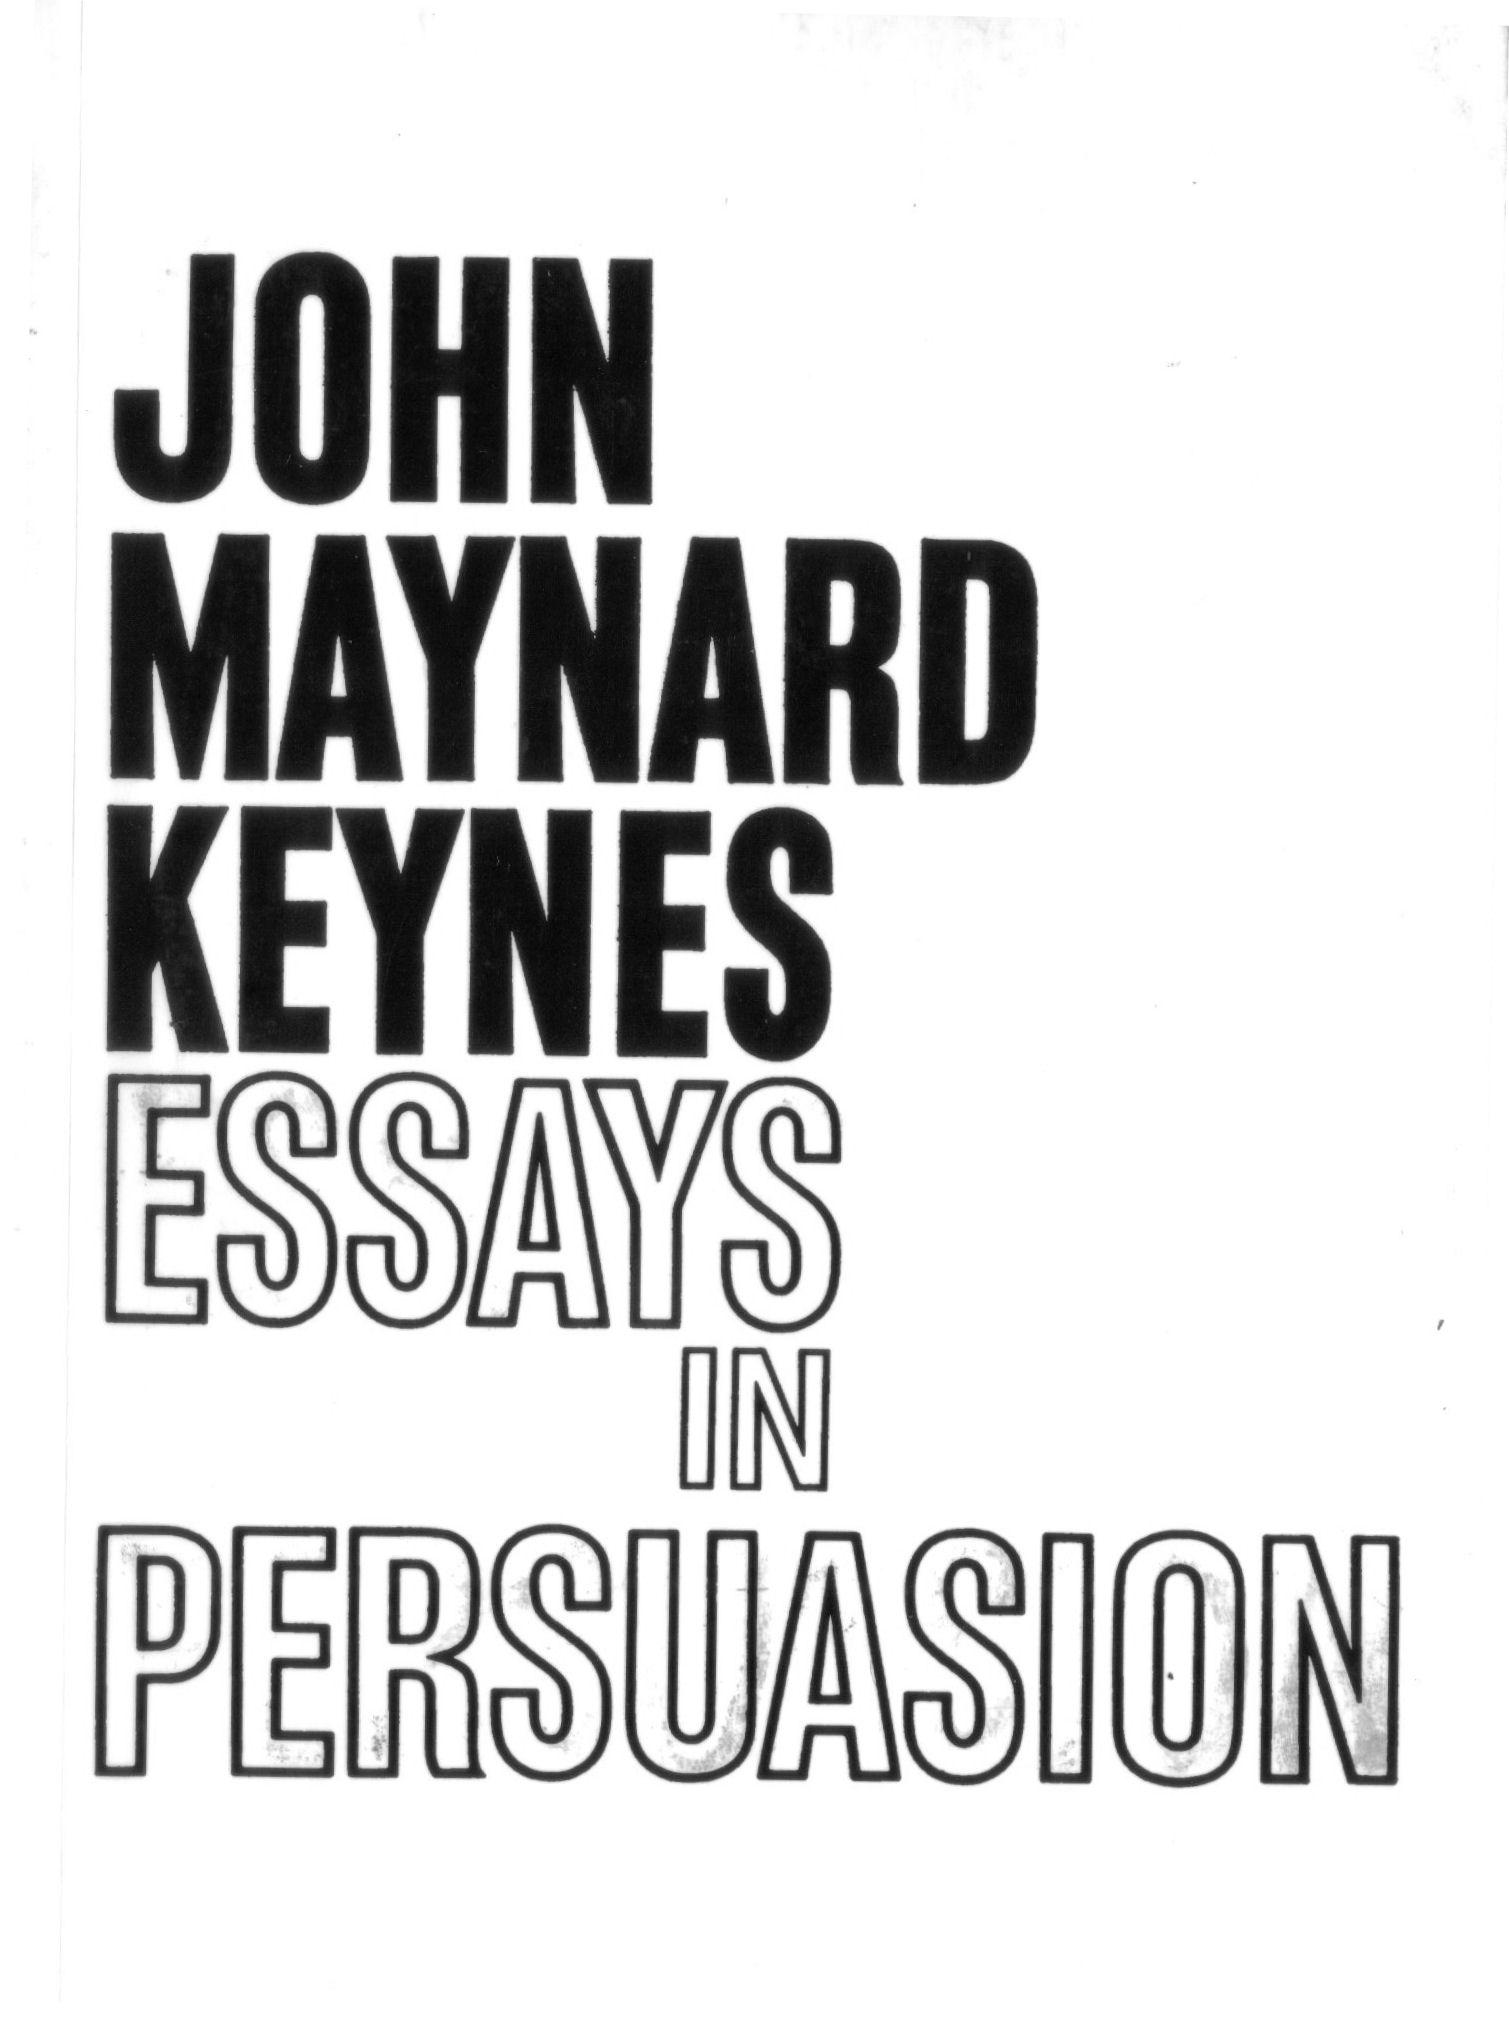 004 Essays In Persuasion Essay Remarkable Audiobook Pdf John Maynard Keynes Summary Full